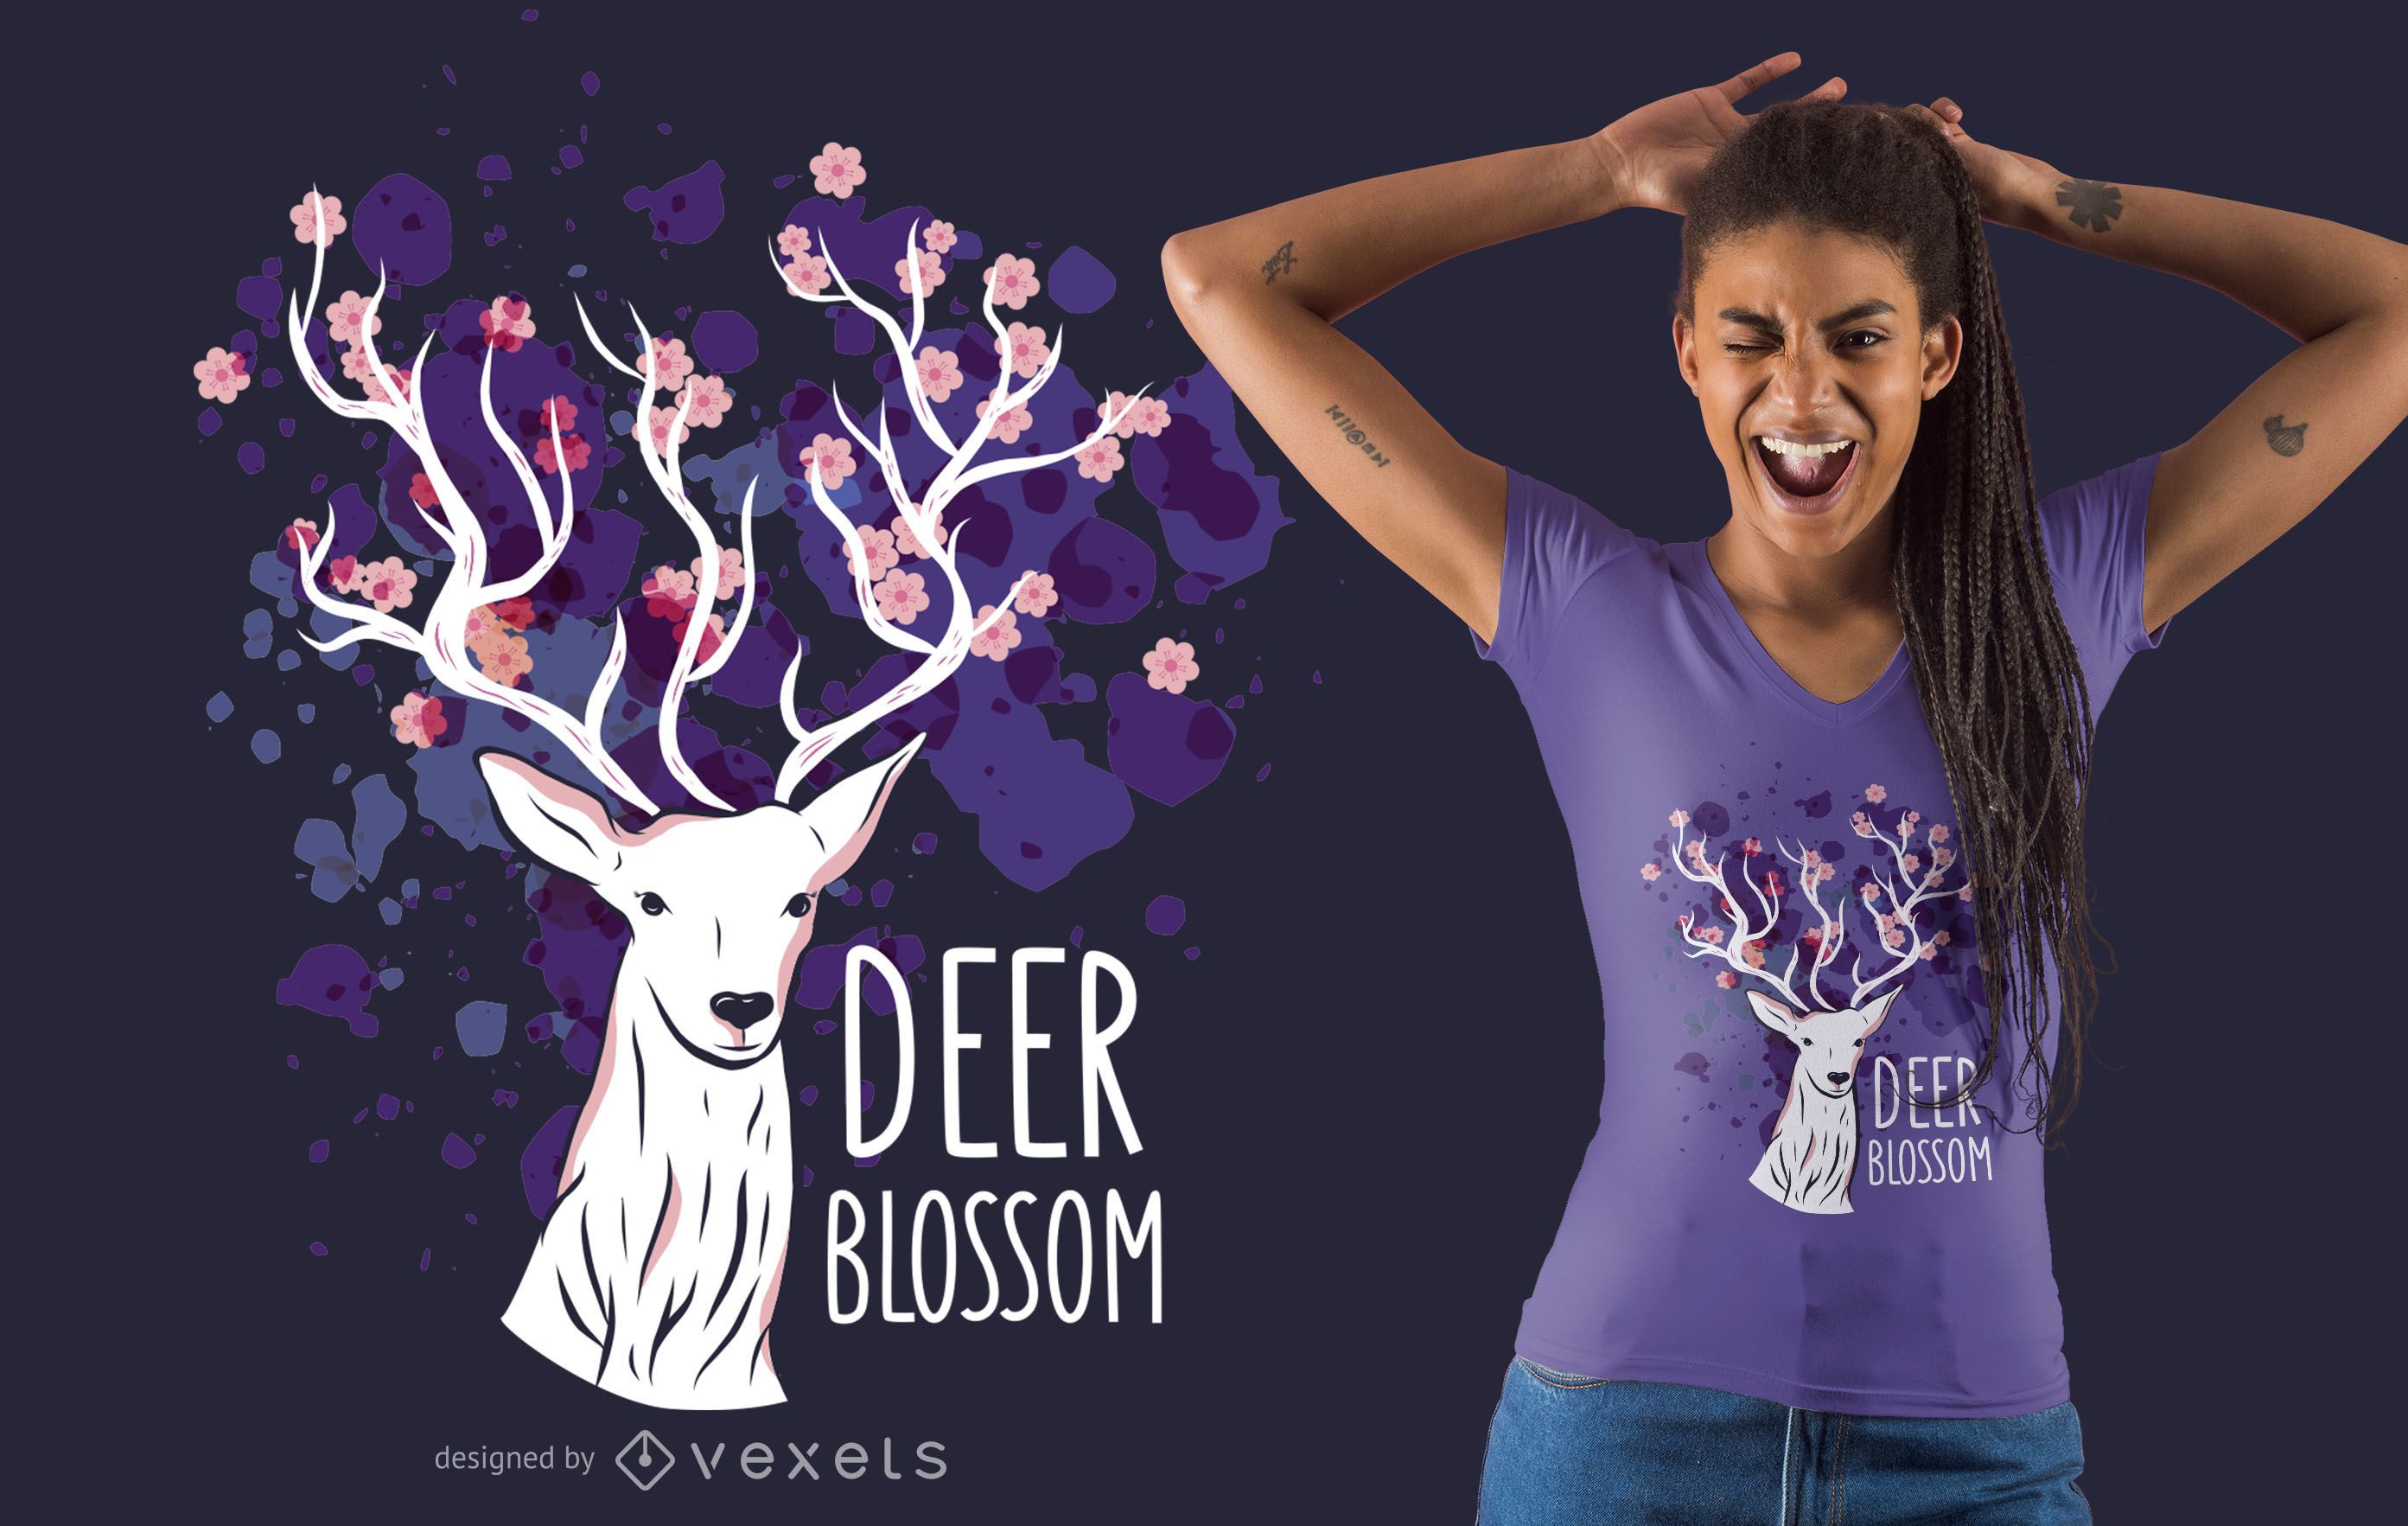 Deer blossom t-shirt design